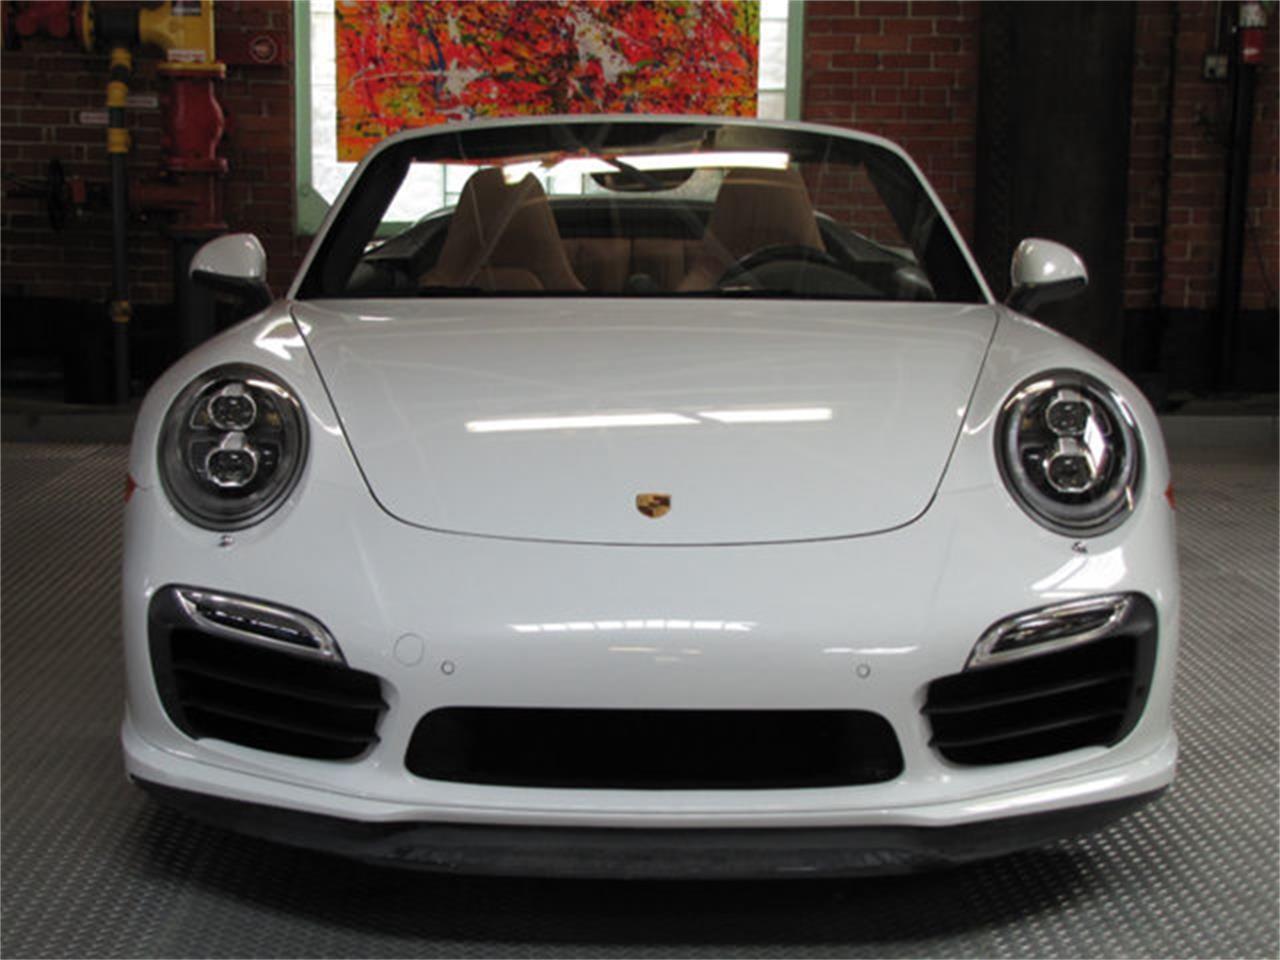 2016 Porsche 911 (CC-1180745) for sale in Hollywood, California